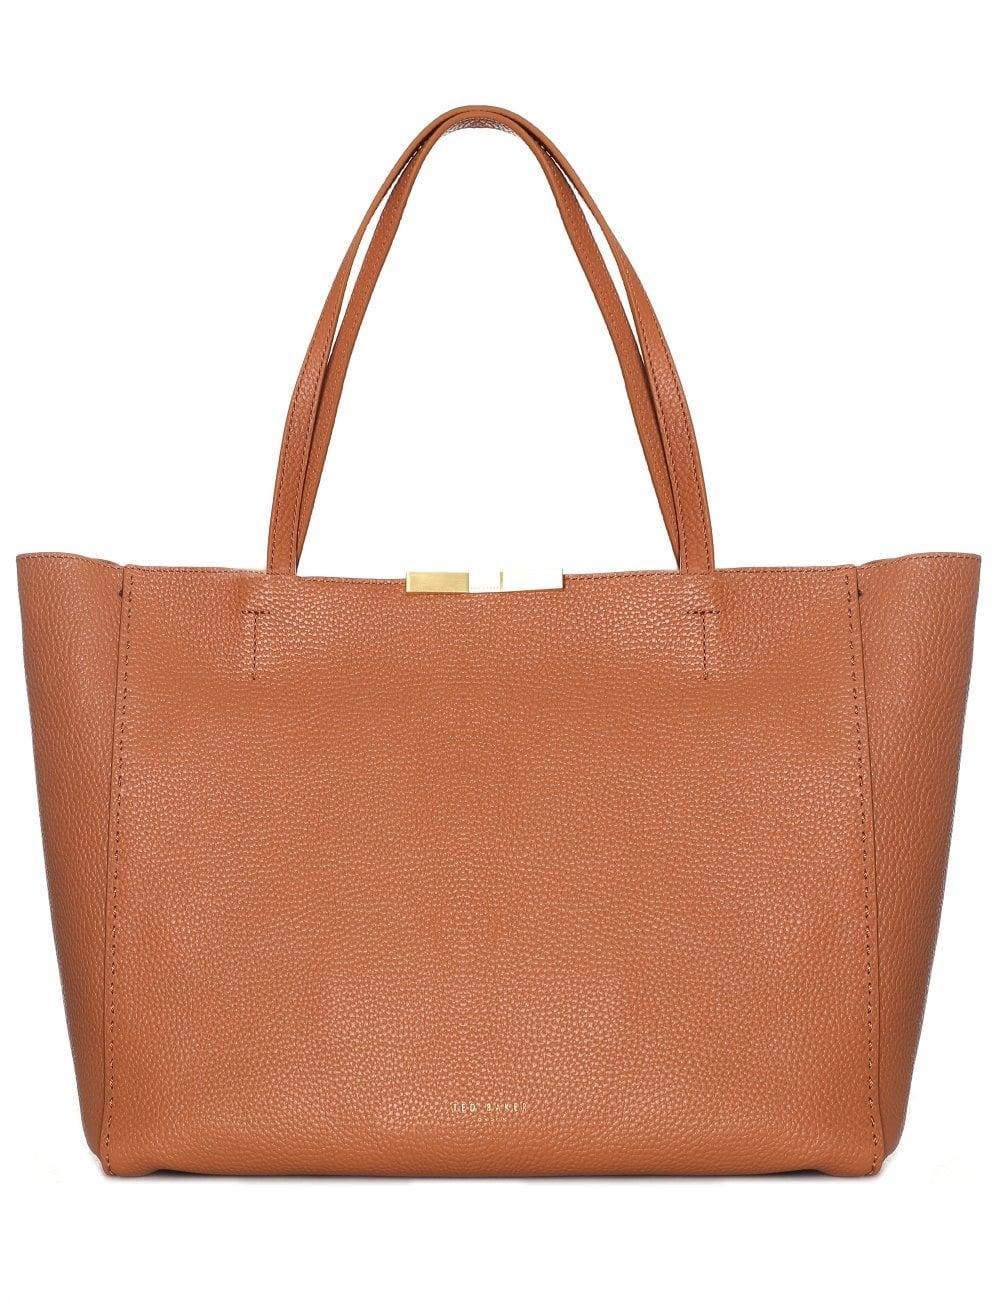 715478b84 Ted Baker Caullie Bow Detail Women s Soft Shopper Tan